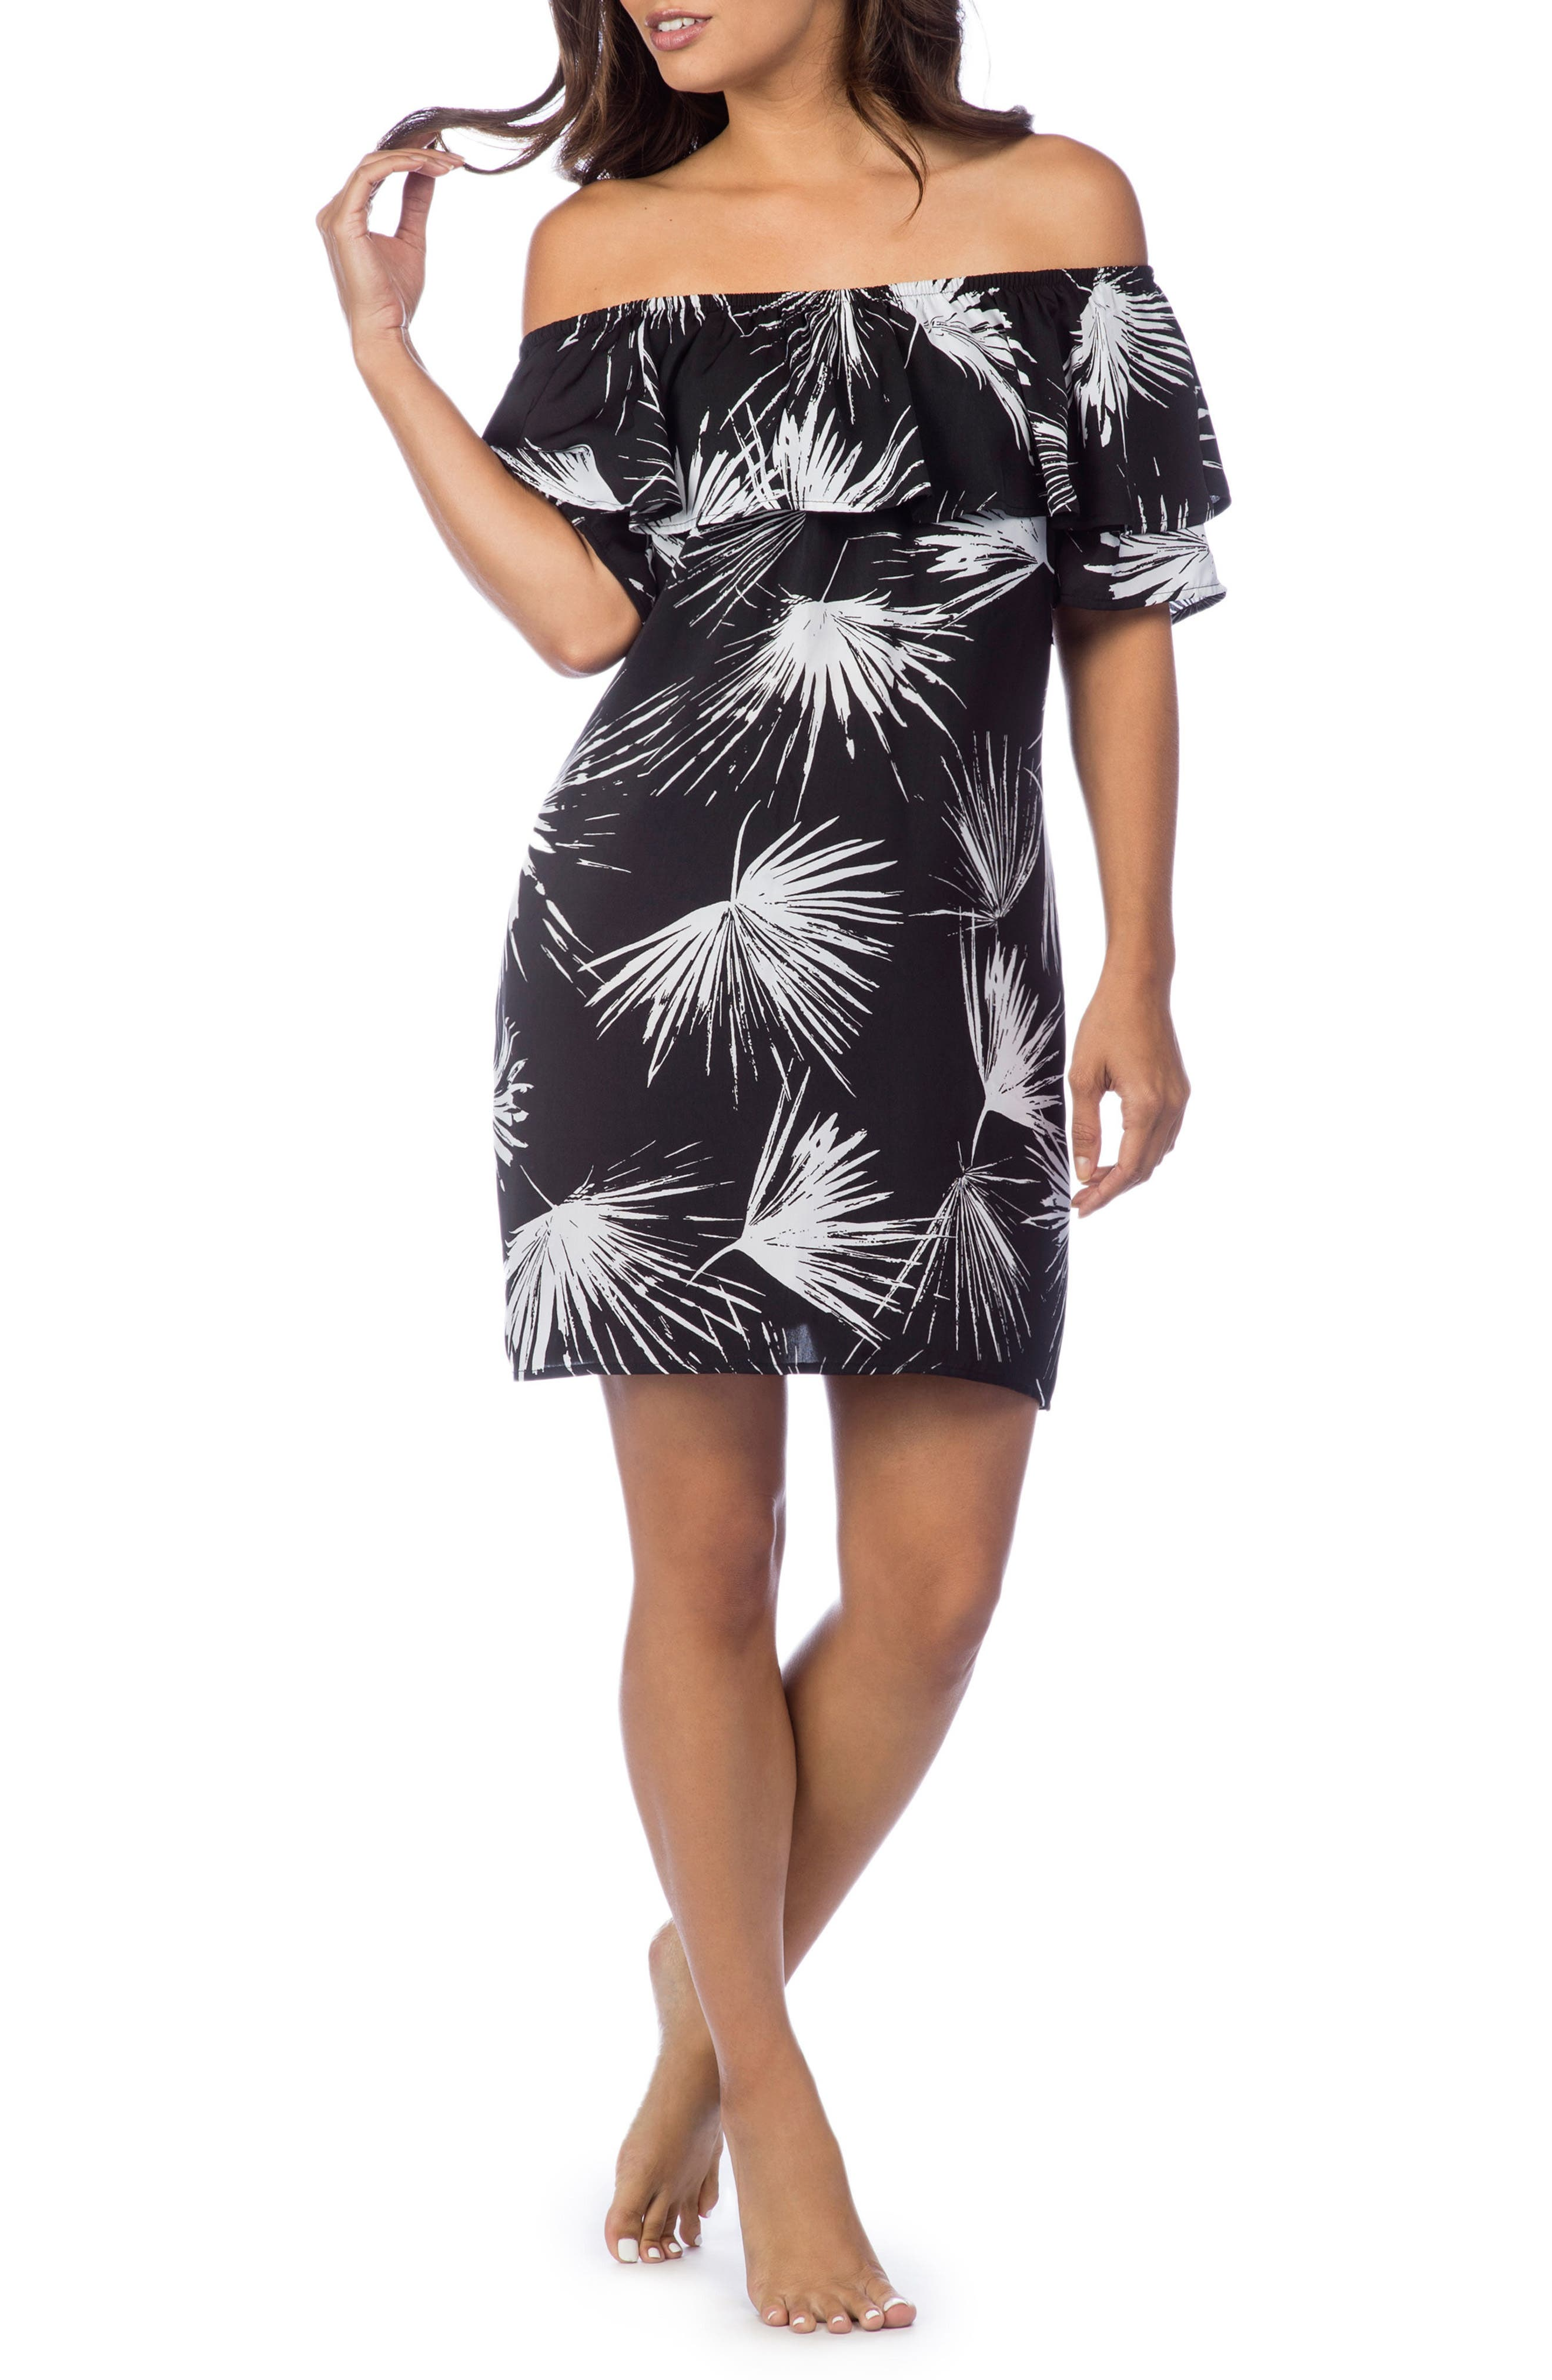 Petal Pusher Off the Shoulder Dress,                             Main thumbnail 1, color,                             Black/ White